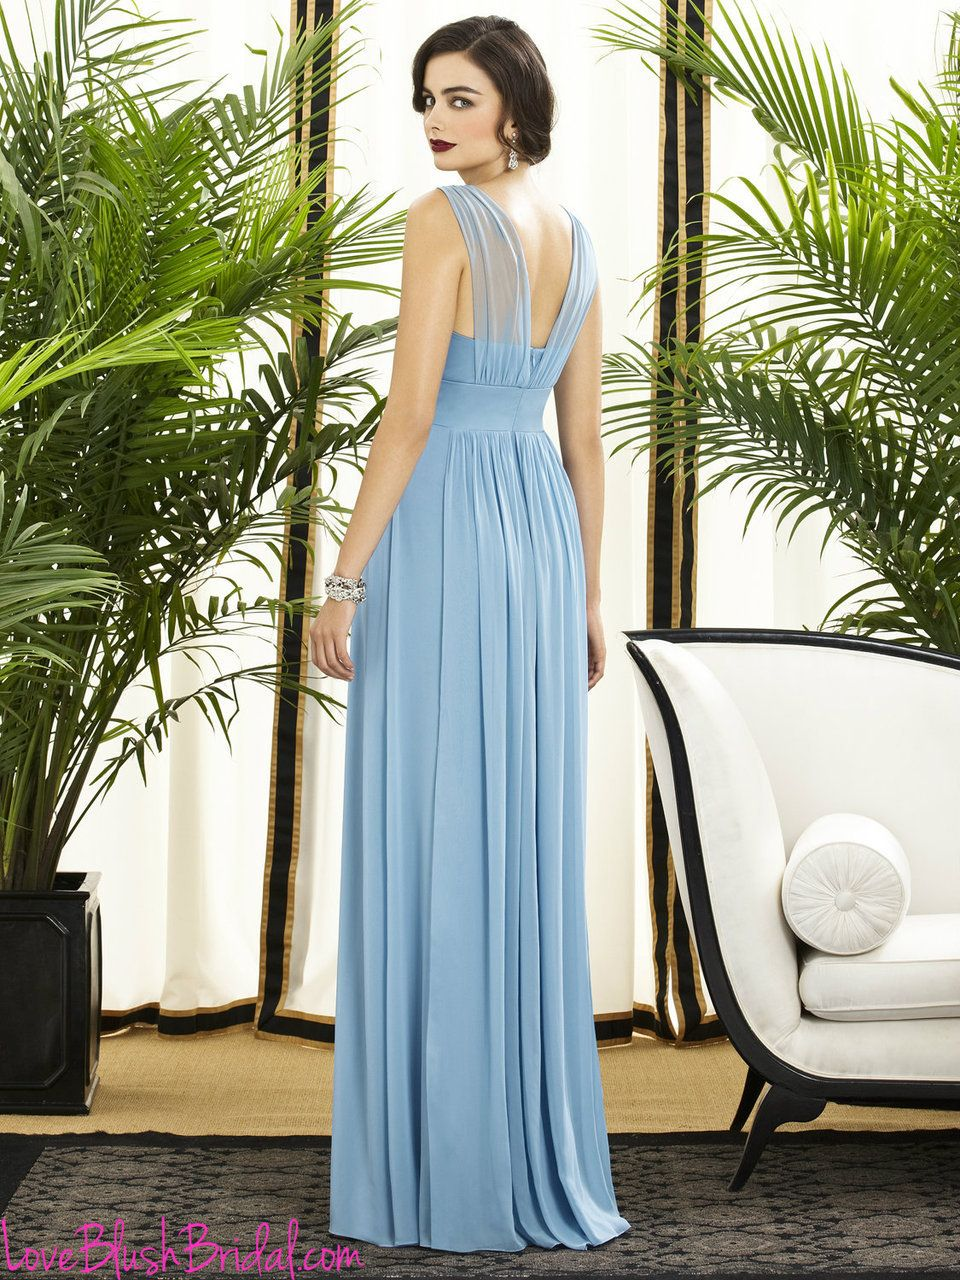 Dessy collection bridesmaid dress style 2890 blush bridal dessy collection bridesmaid dress style 2890 blush bridal ombrellifo Choice Image